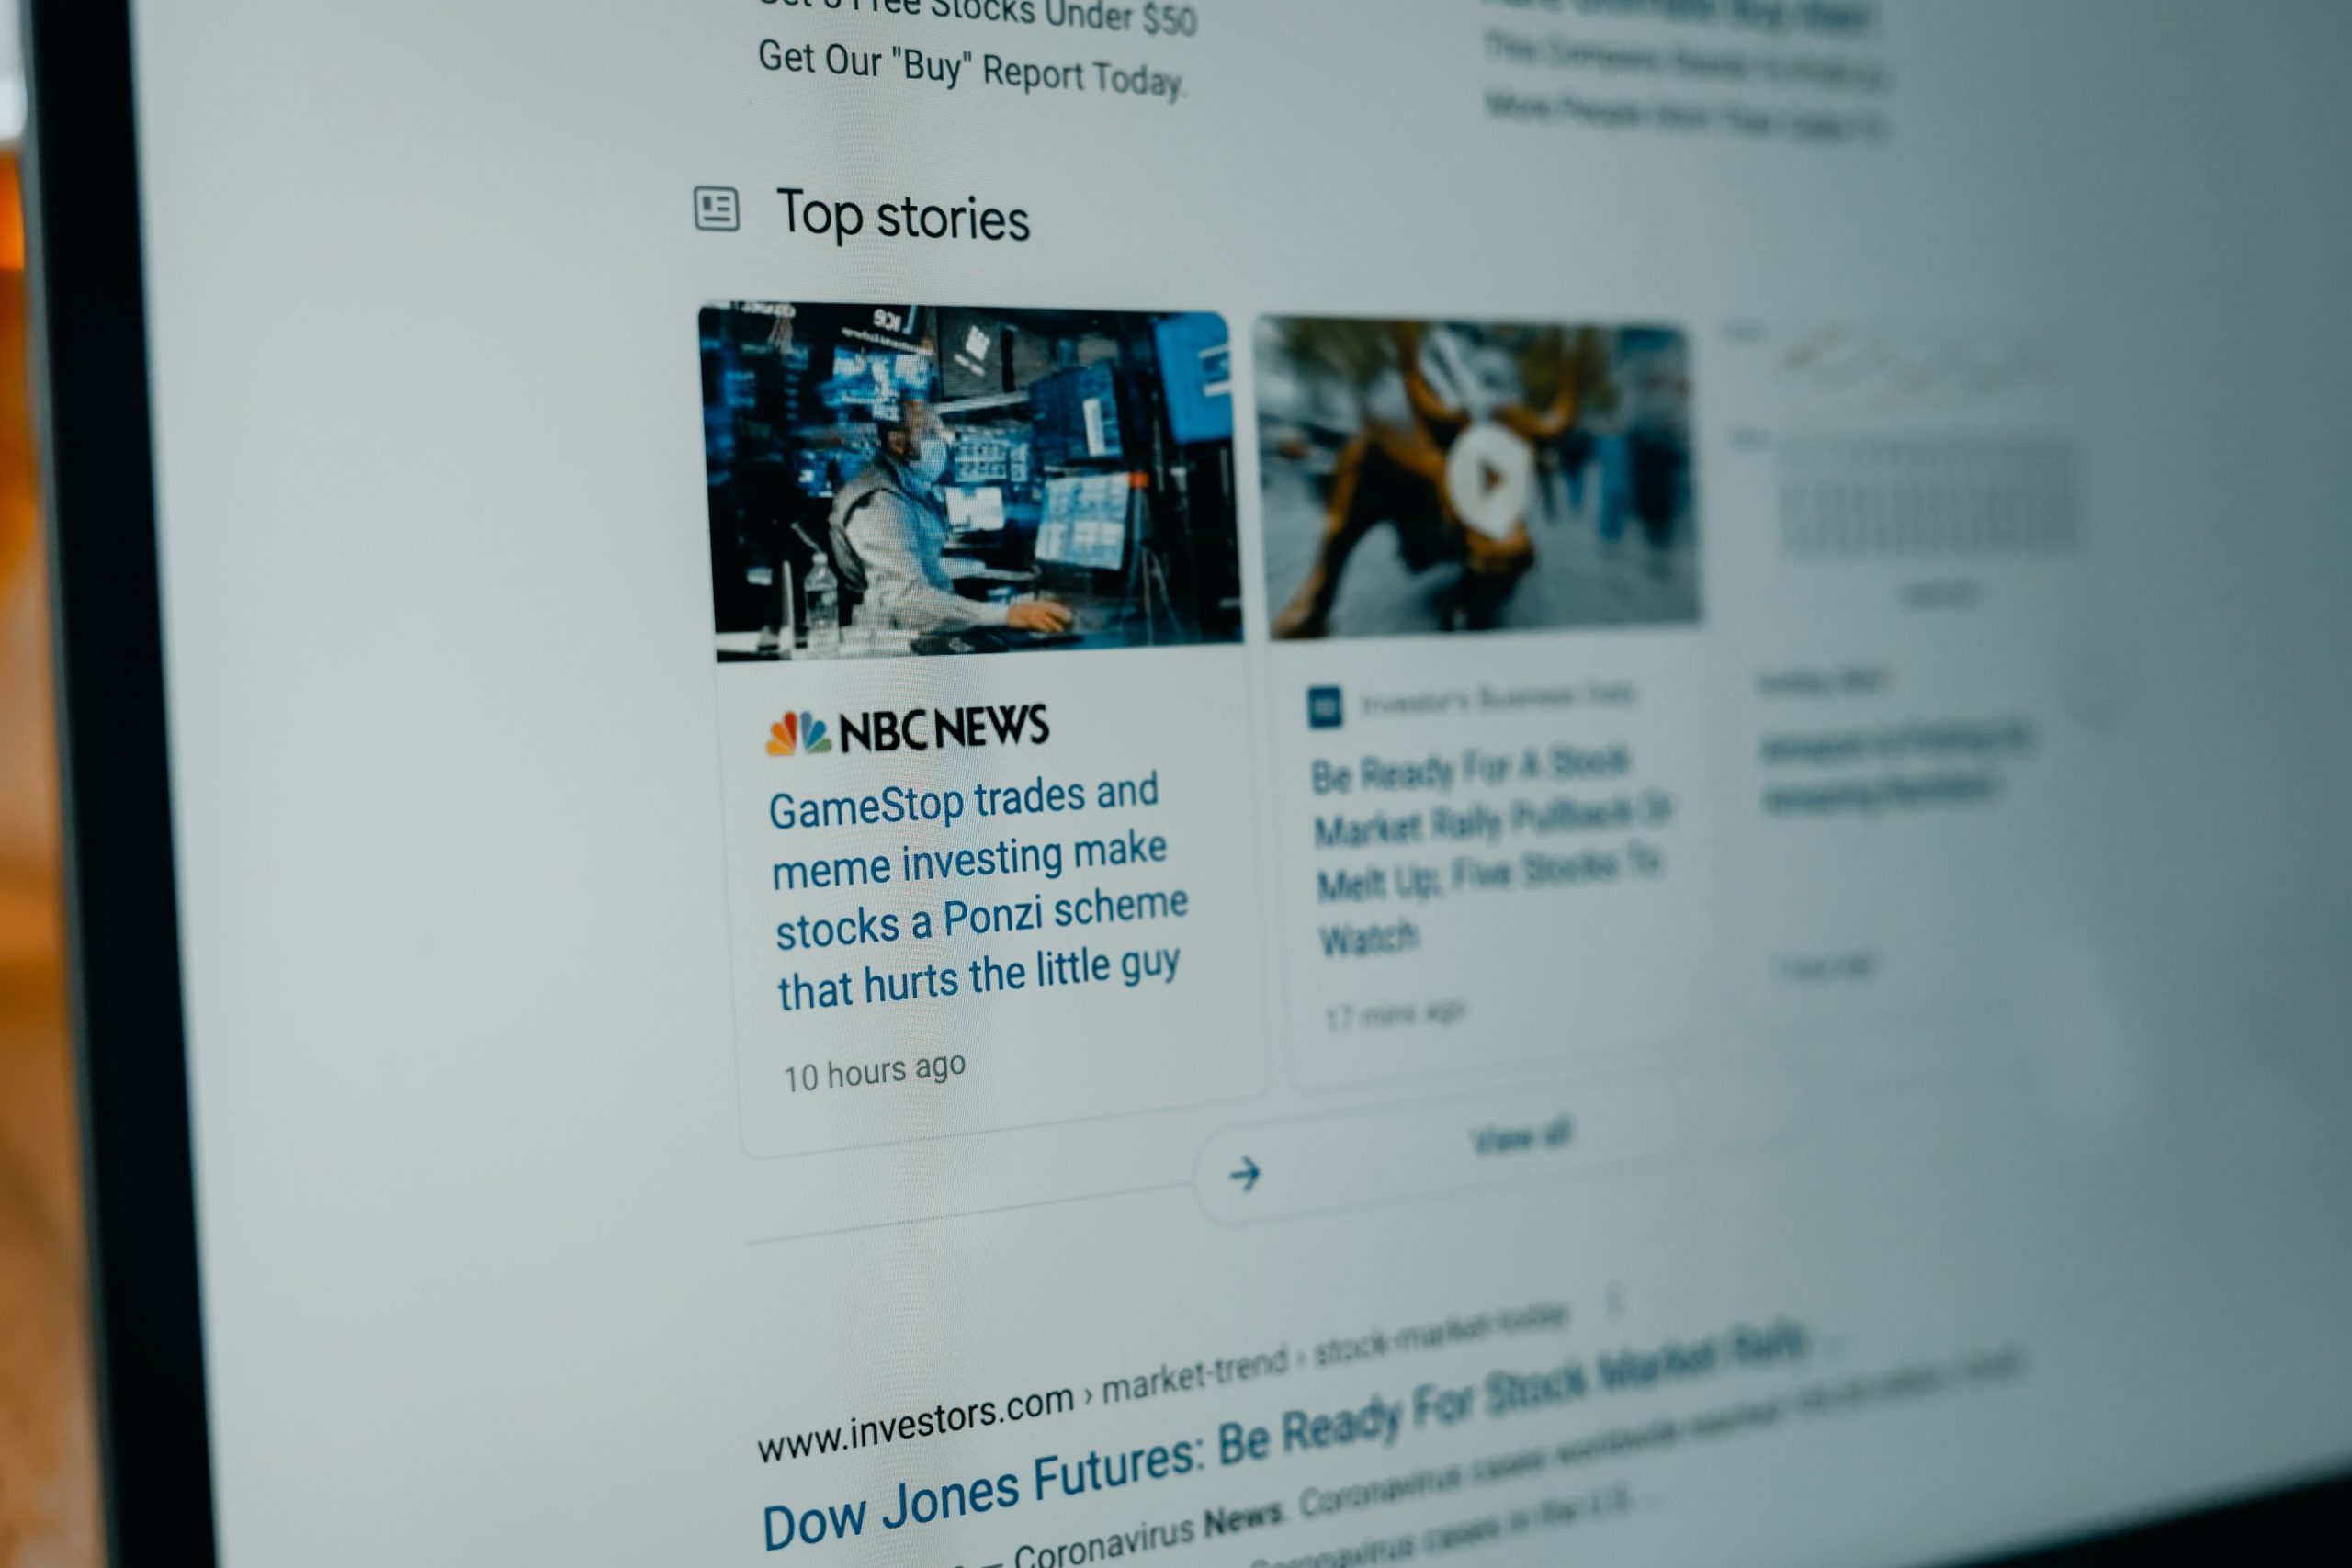 NBC News: GameStop trades and meme investing   Via techdaily.ca   #stocks #finance #investing #gme #wallstreetbets #roaringkitty